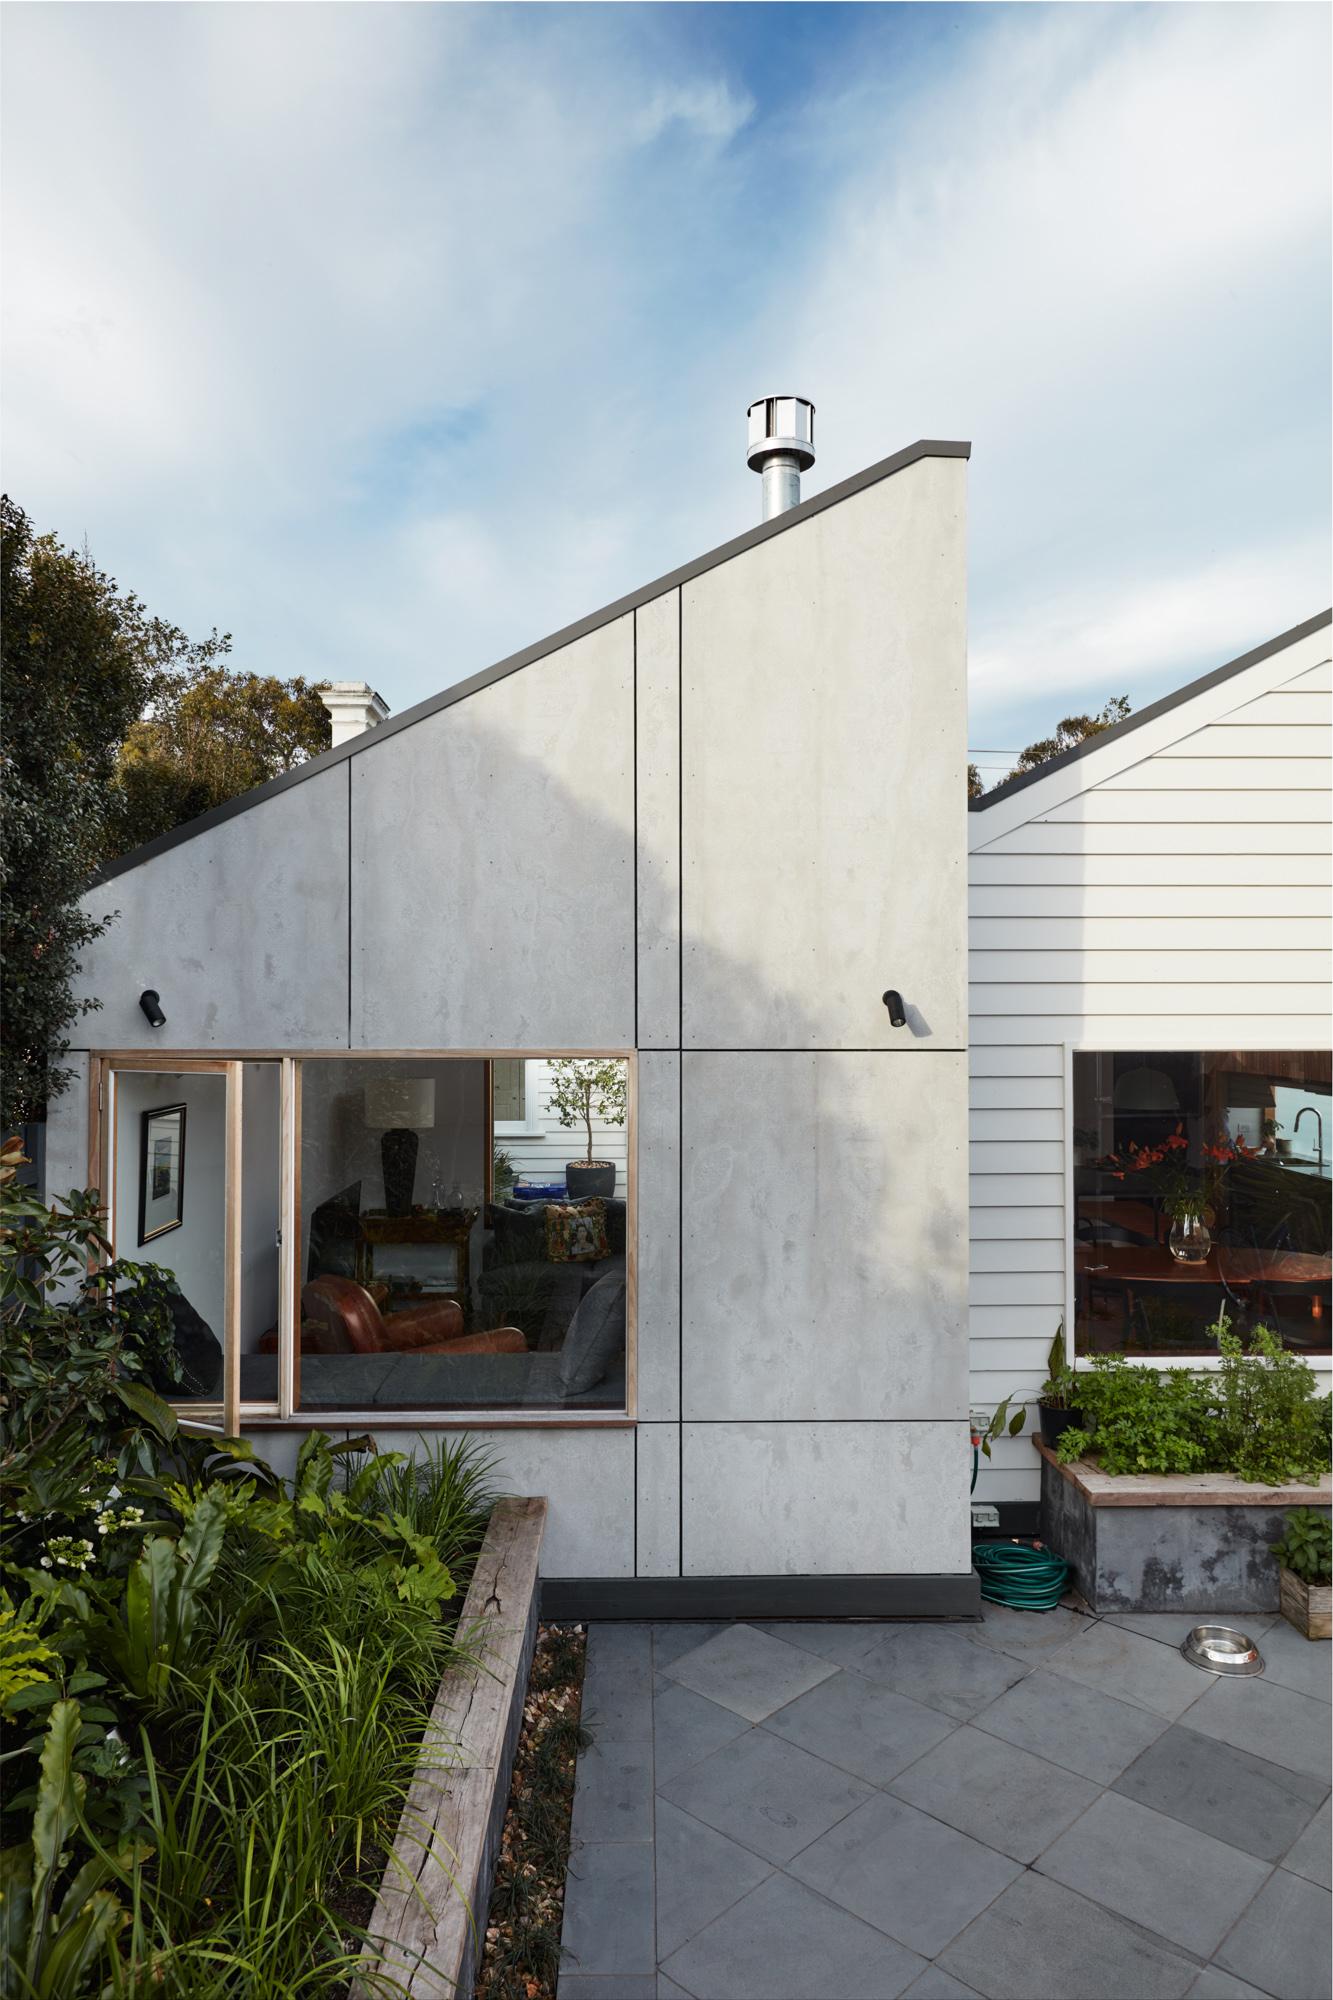 Gallery Of Albert Park House Local Australian Bespoke Architecture & Interiors Albert Park, Melbourne Image 5